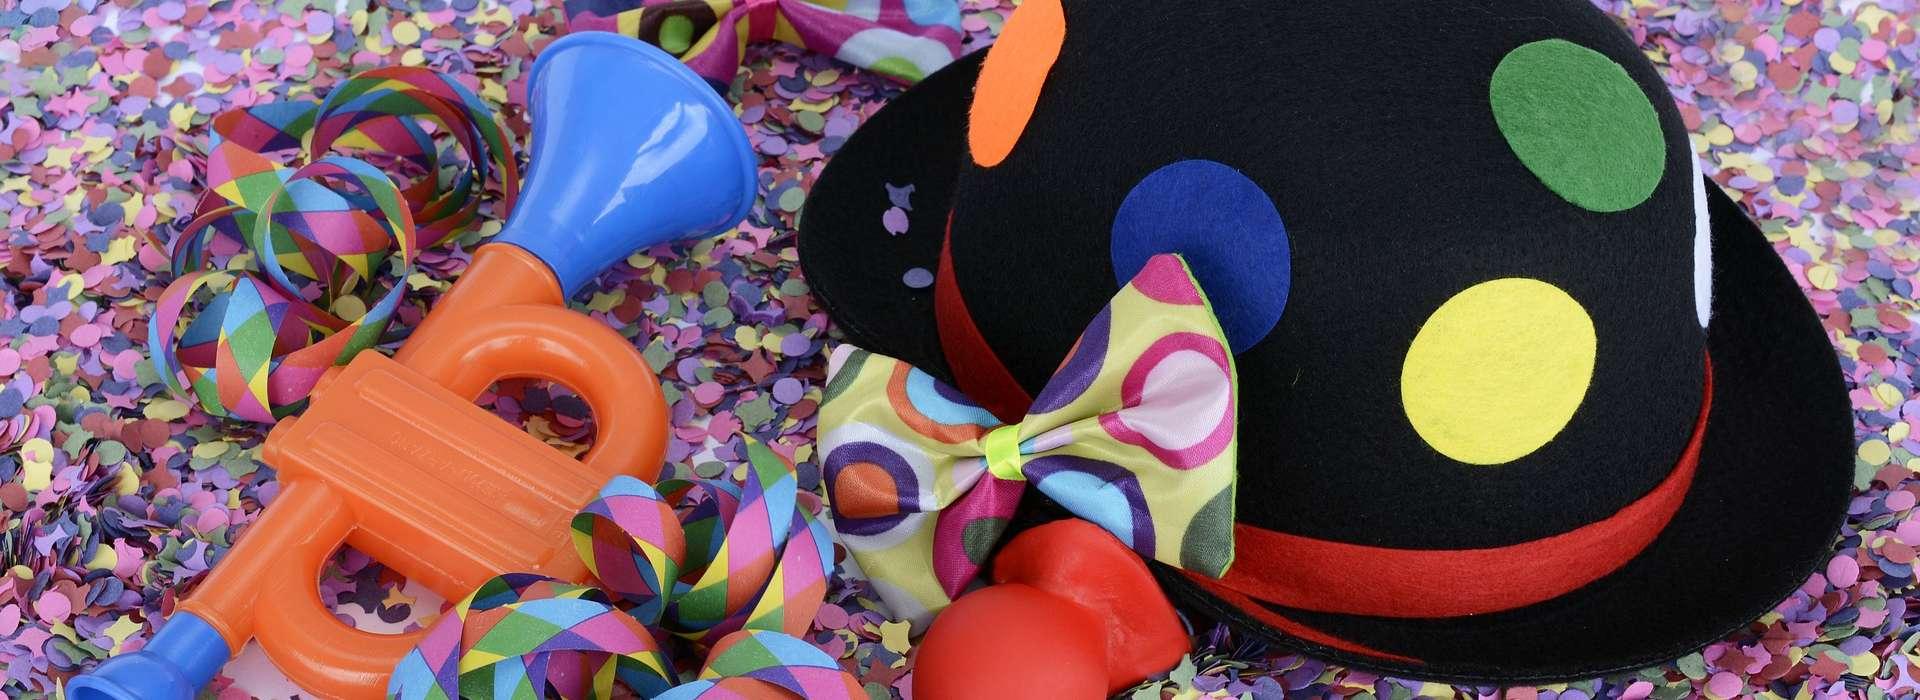 Slider d'images de l'animation Visio animation  3/9 ans  1 heure cirque